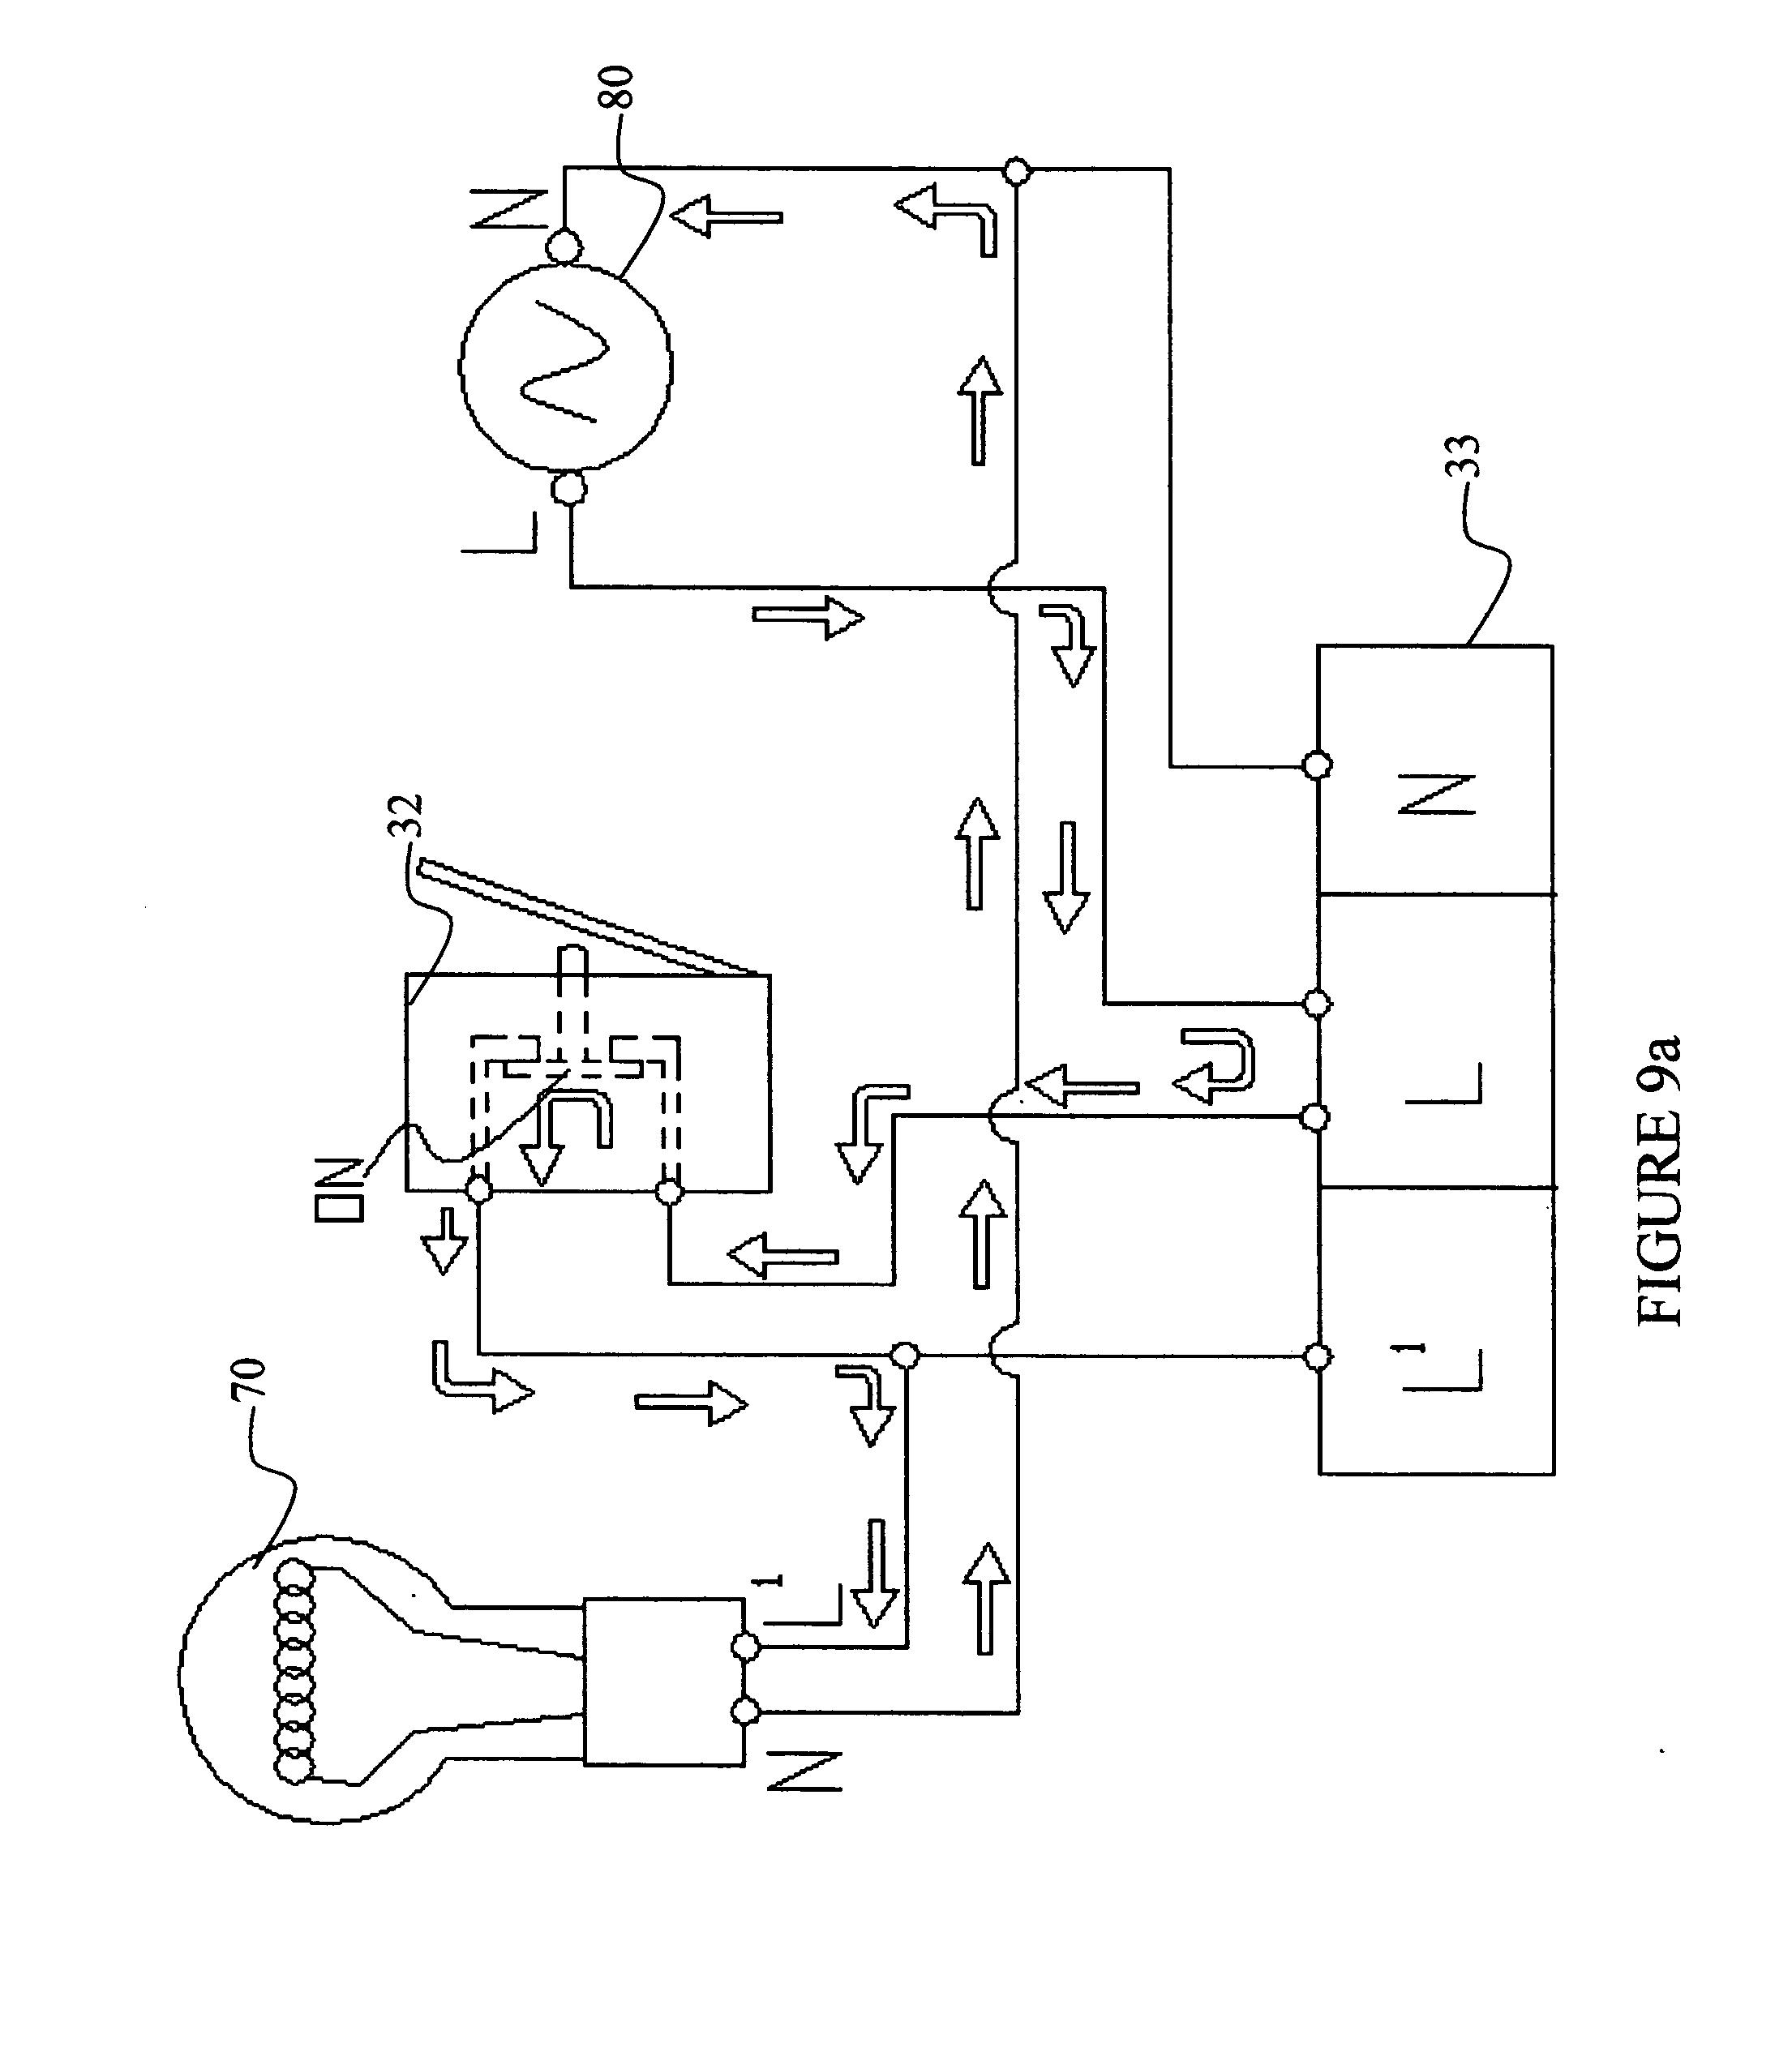 Pir light wiring diagram holden colorado wiring diagram